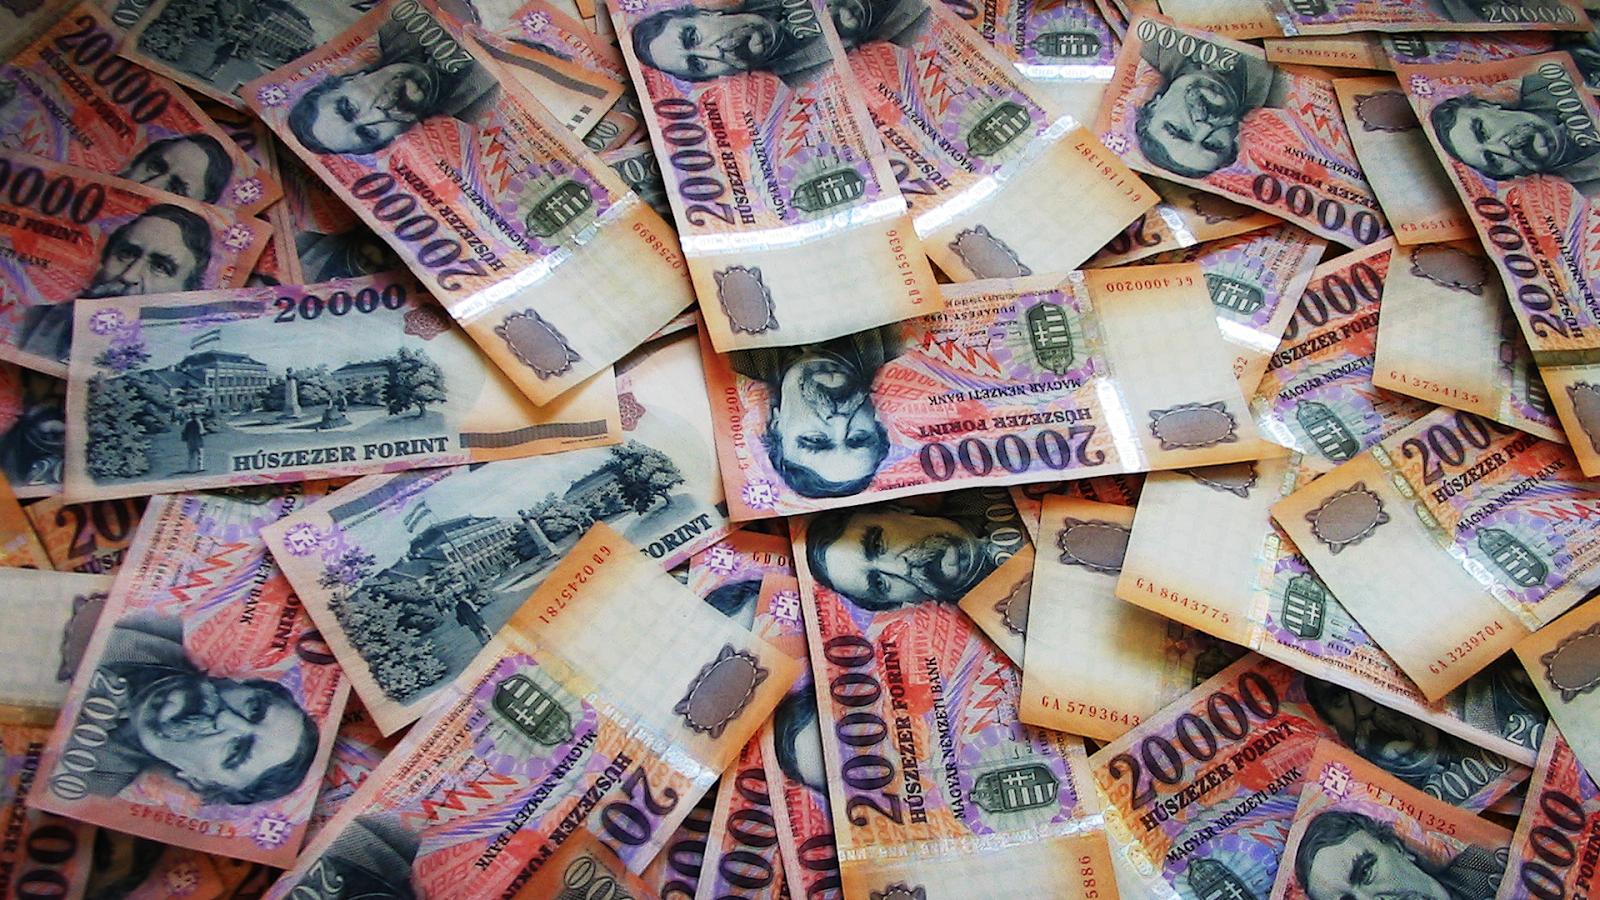 -money-hungary-cash-business-forint-1-kg-kenyer-fresh-new-hd-wallpaper--.png